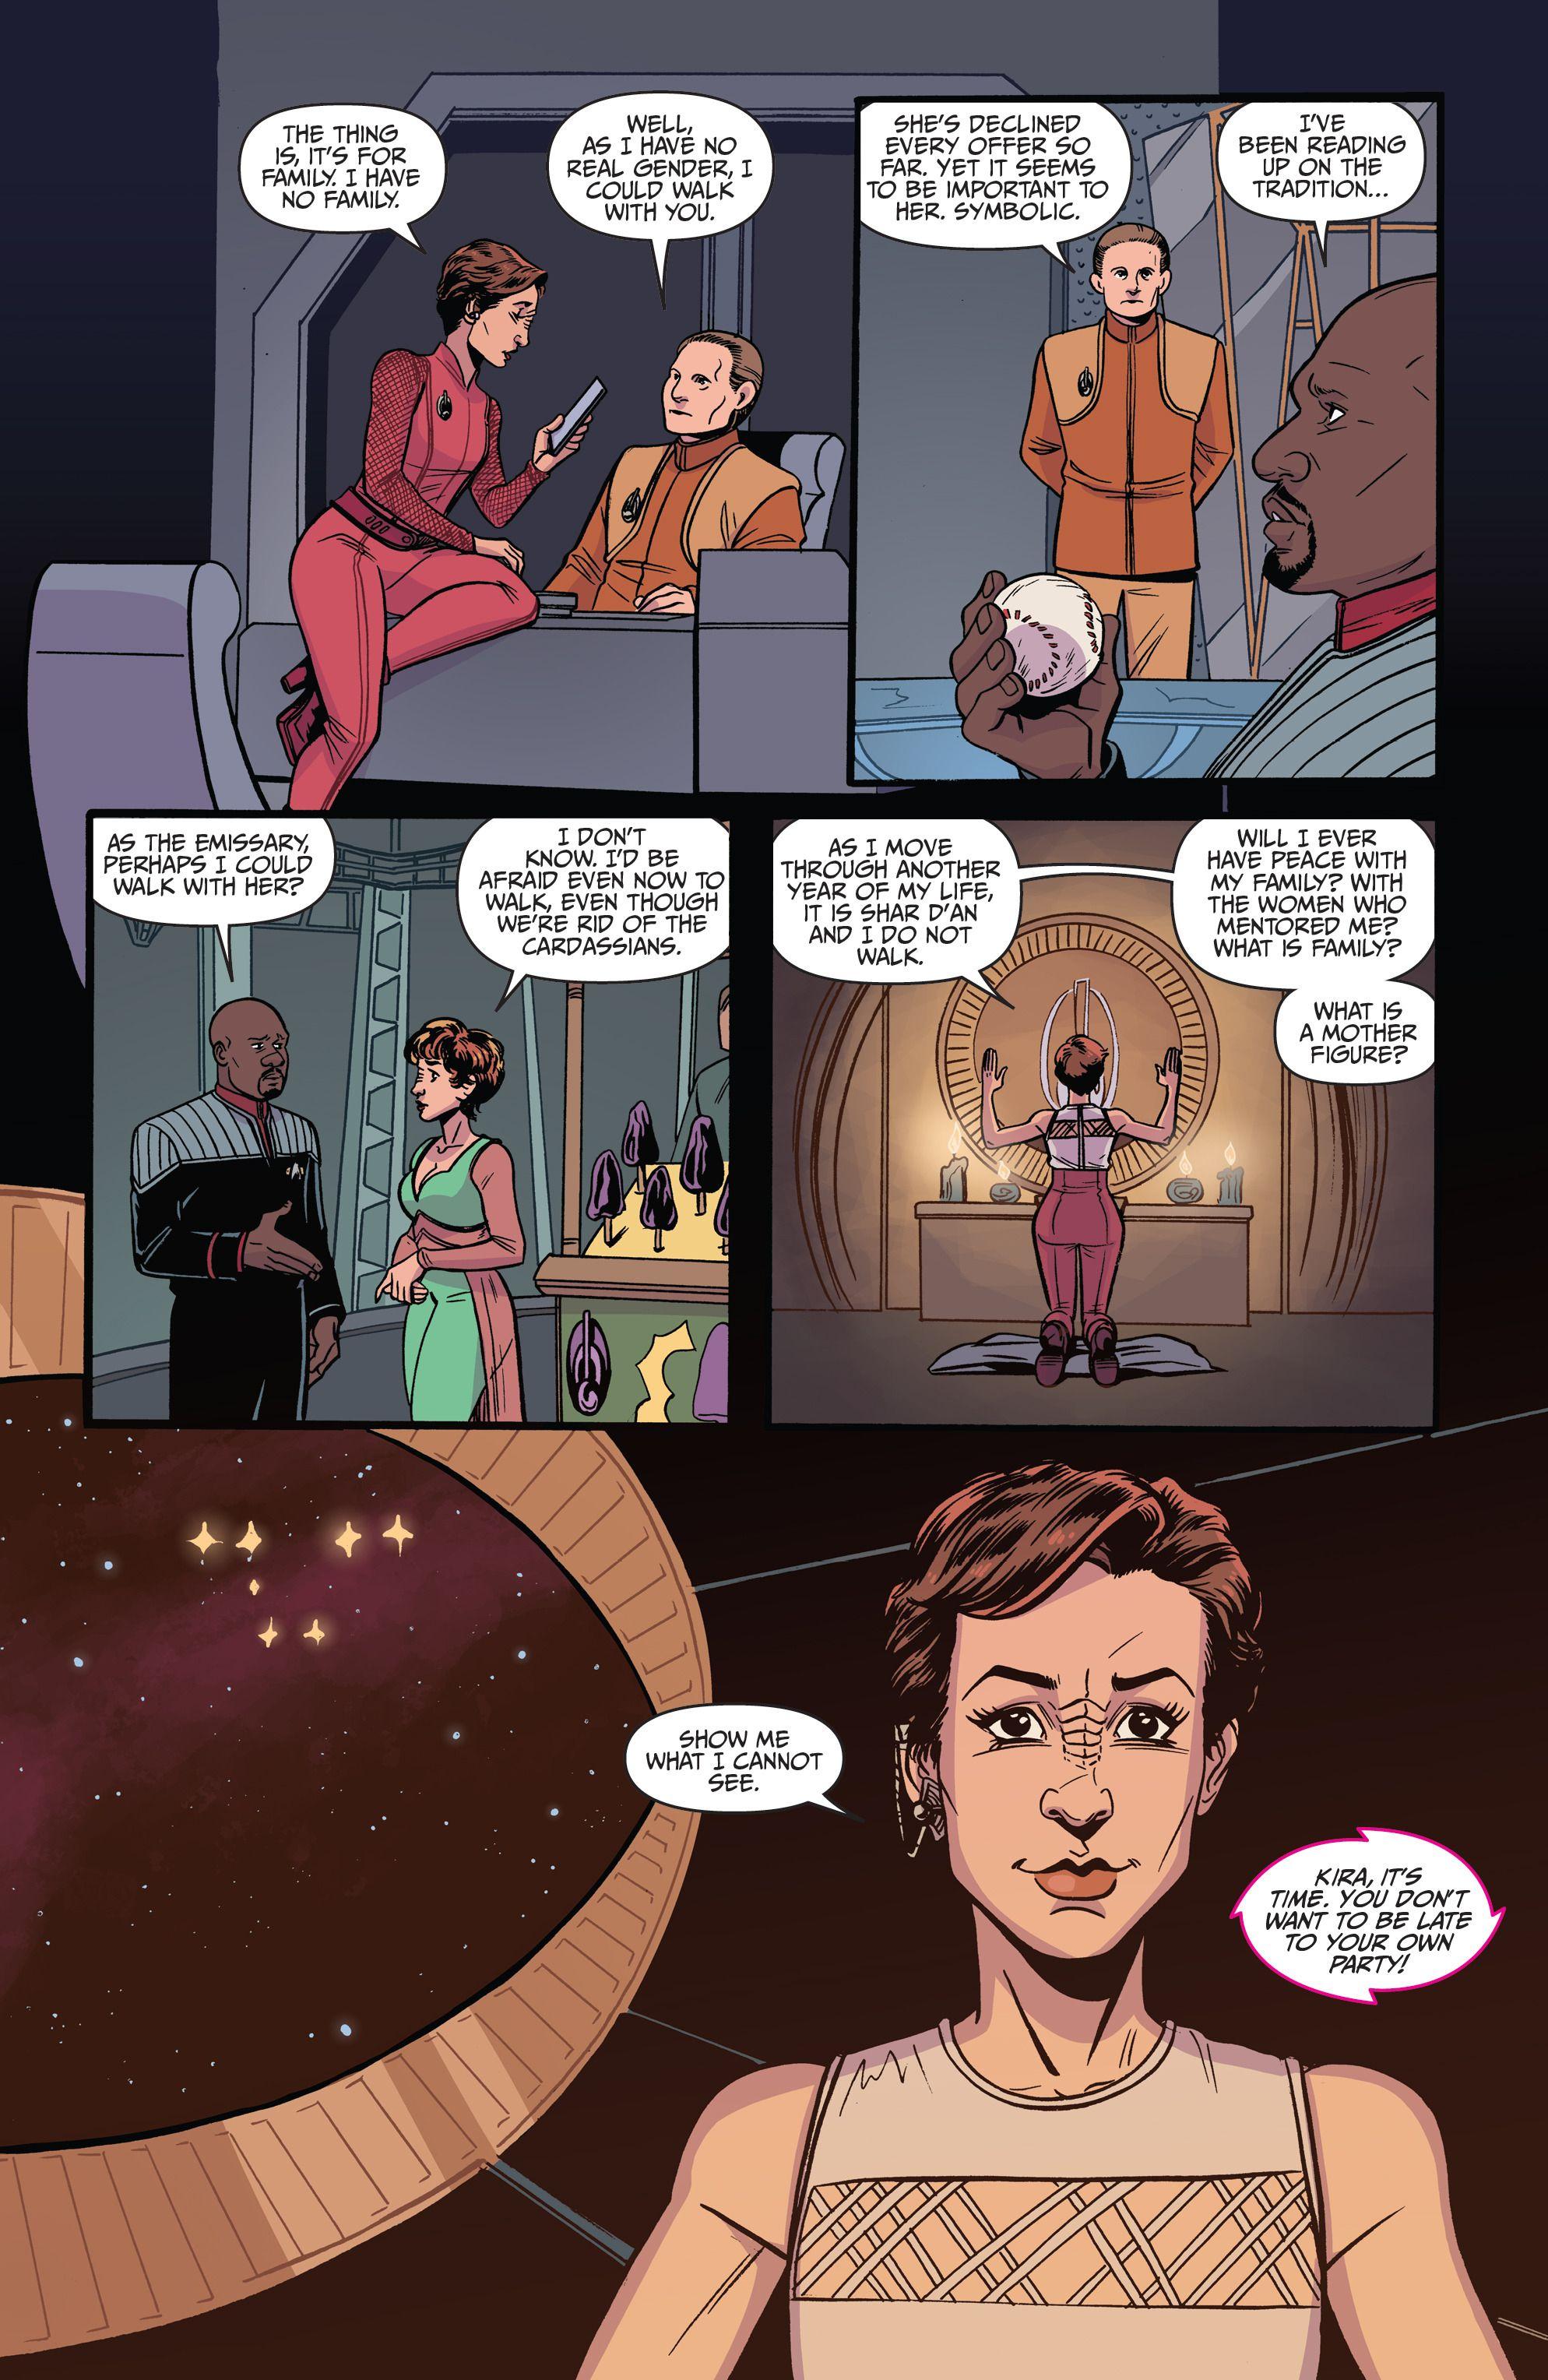 Star Trek: Waypoint Issue # 3 - Leia Star Trek: Waypoint Issue # 3 comic on-line em alta qualidade